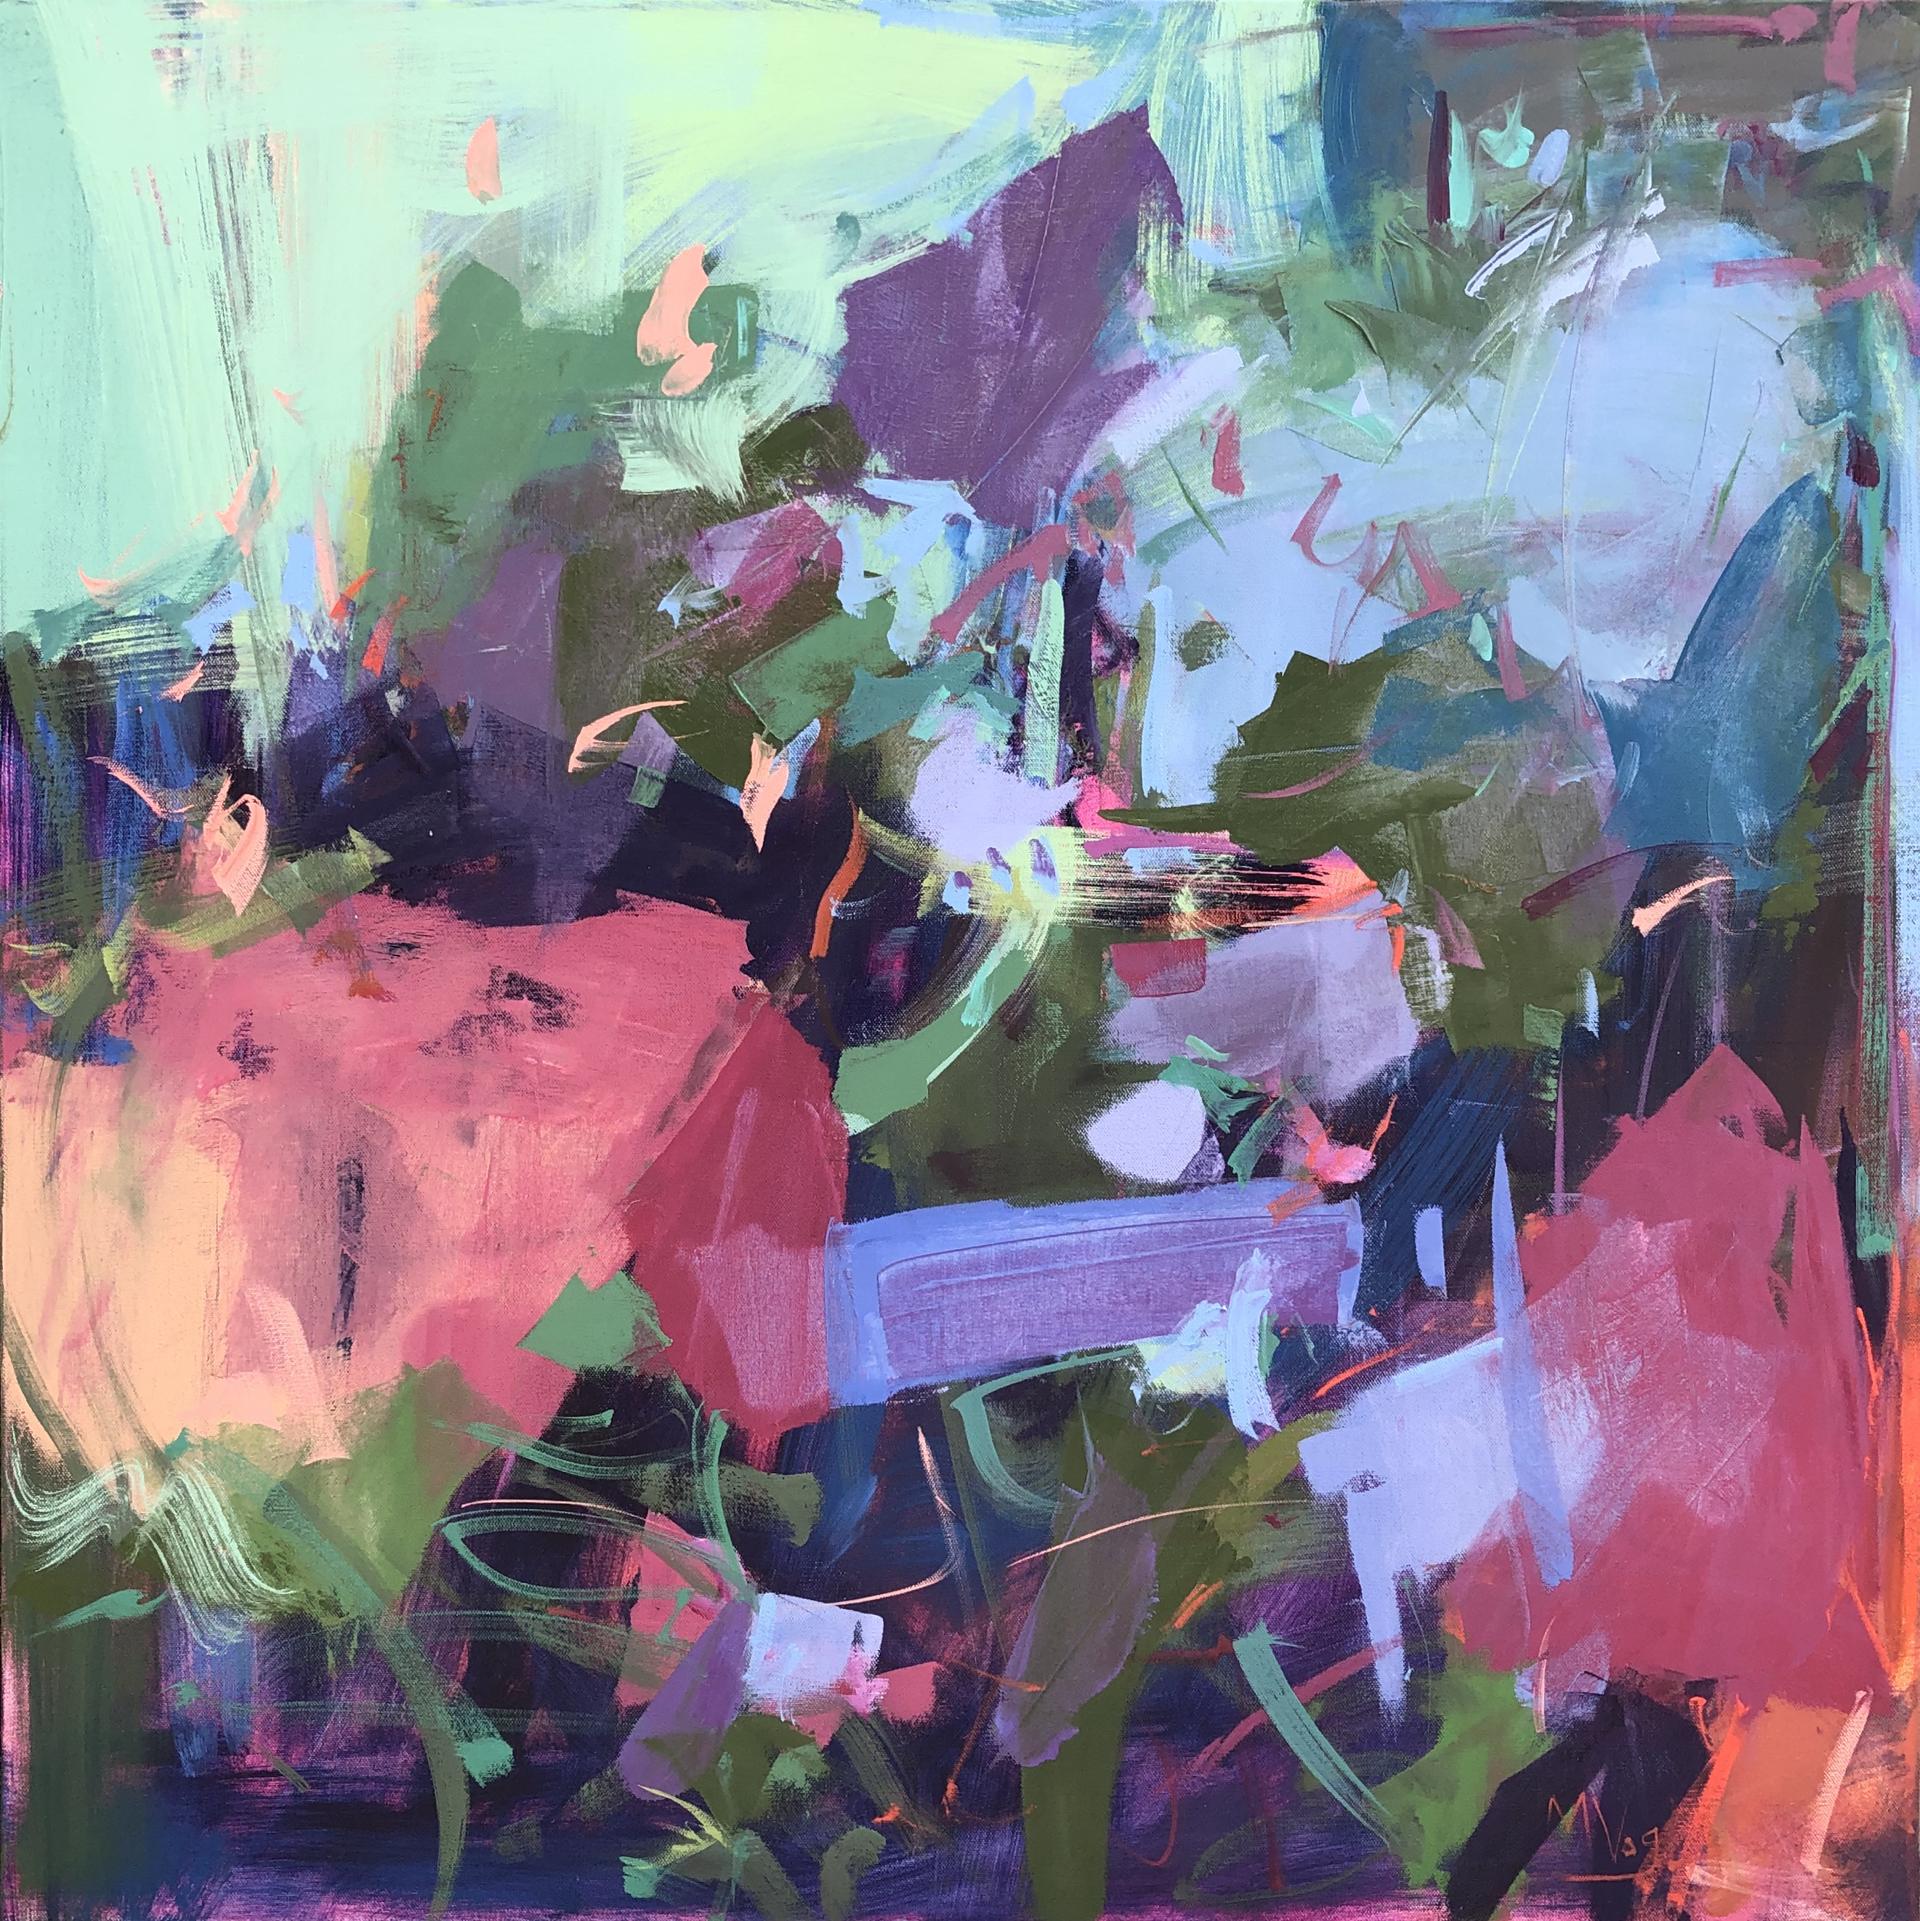 Raspberry Jelly by Marissa Vogl